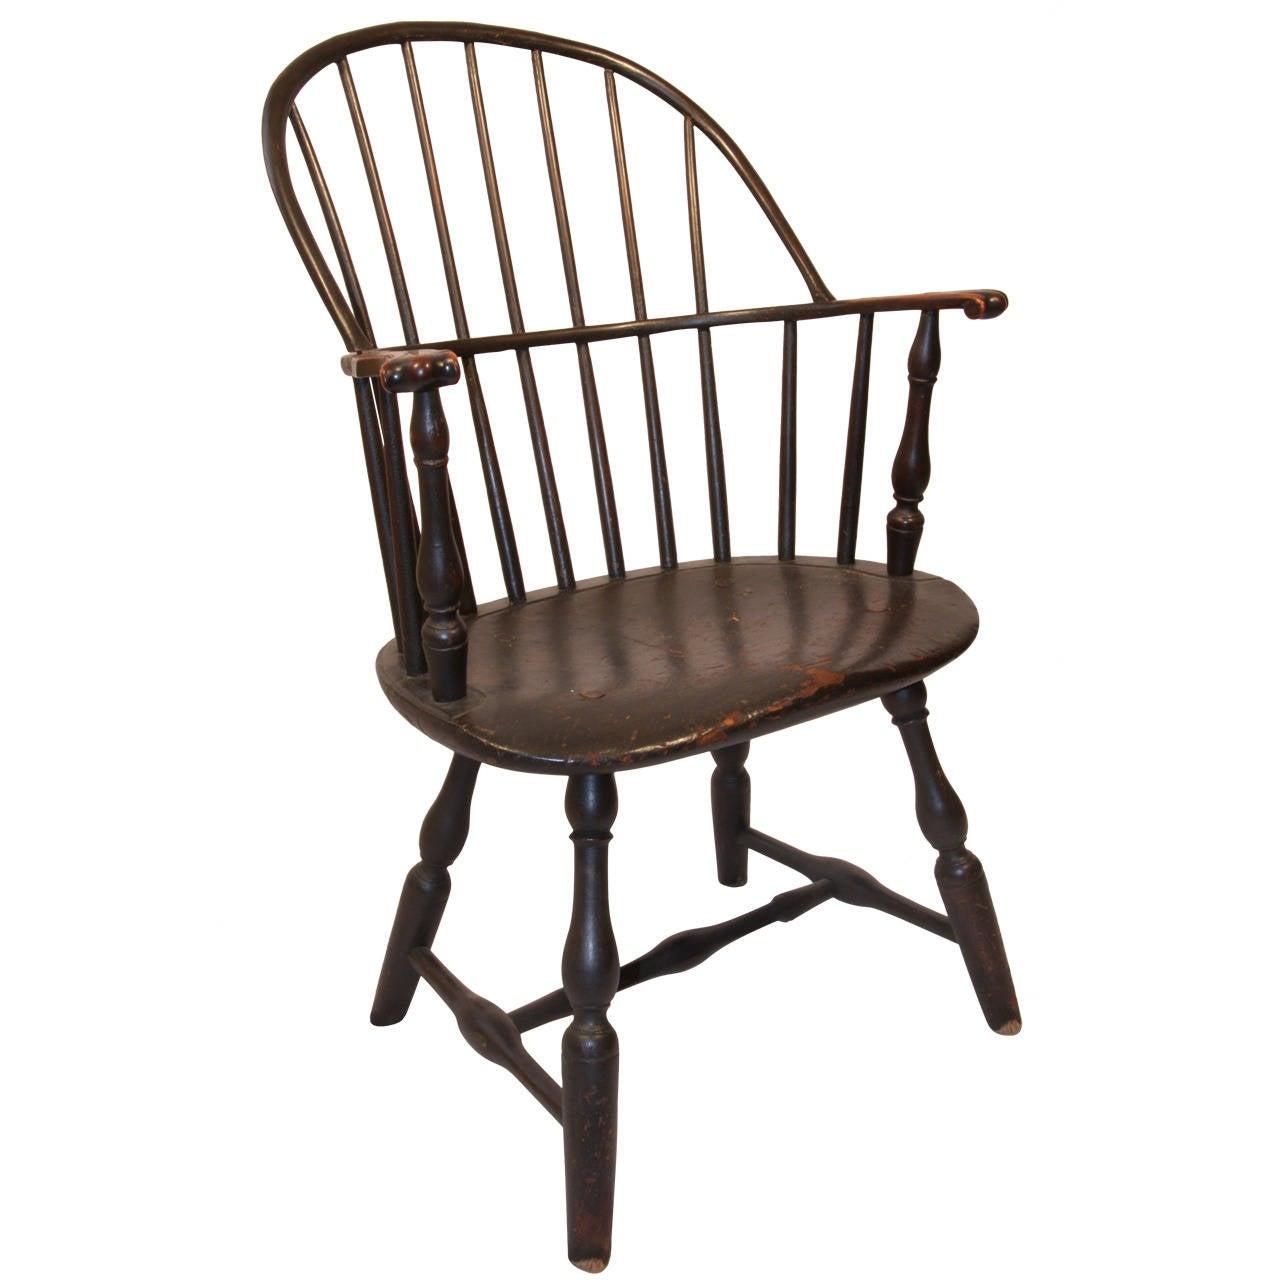 18th Century Connecticut Sack Back Knuckle Arm Windsor